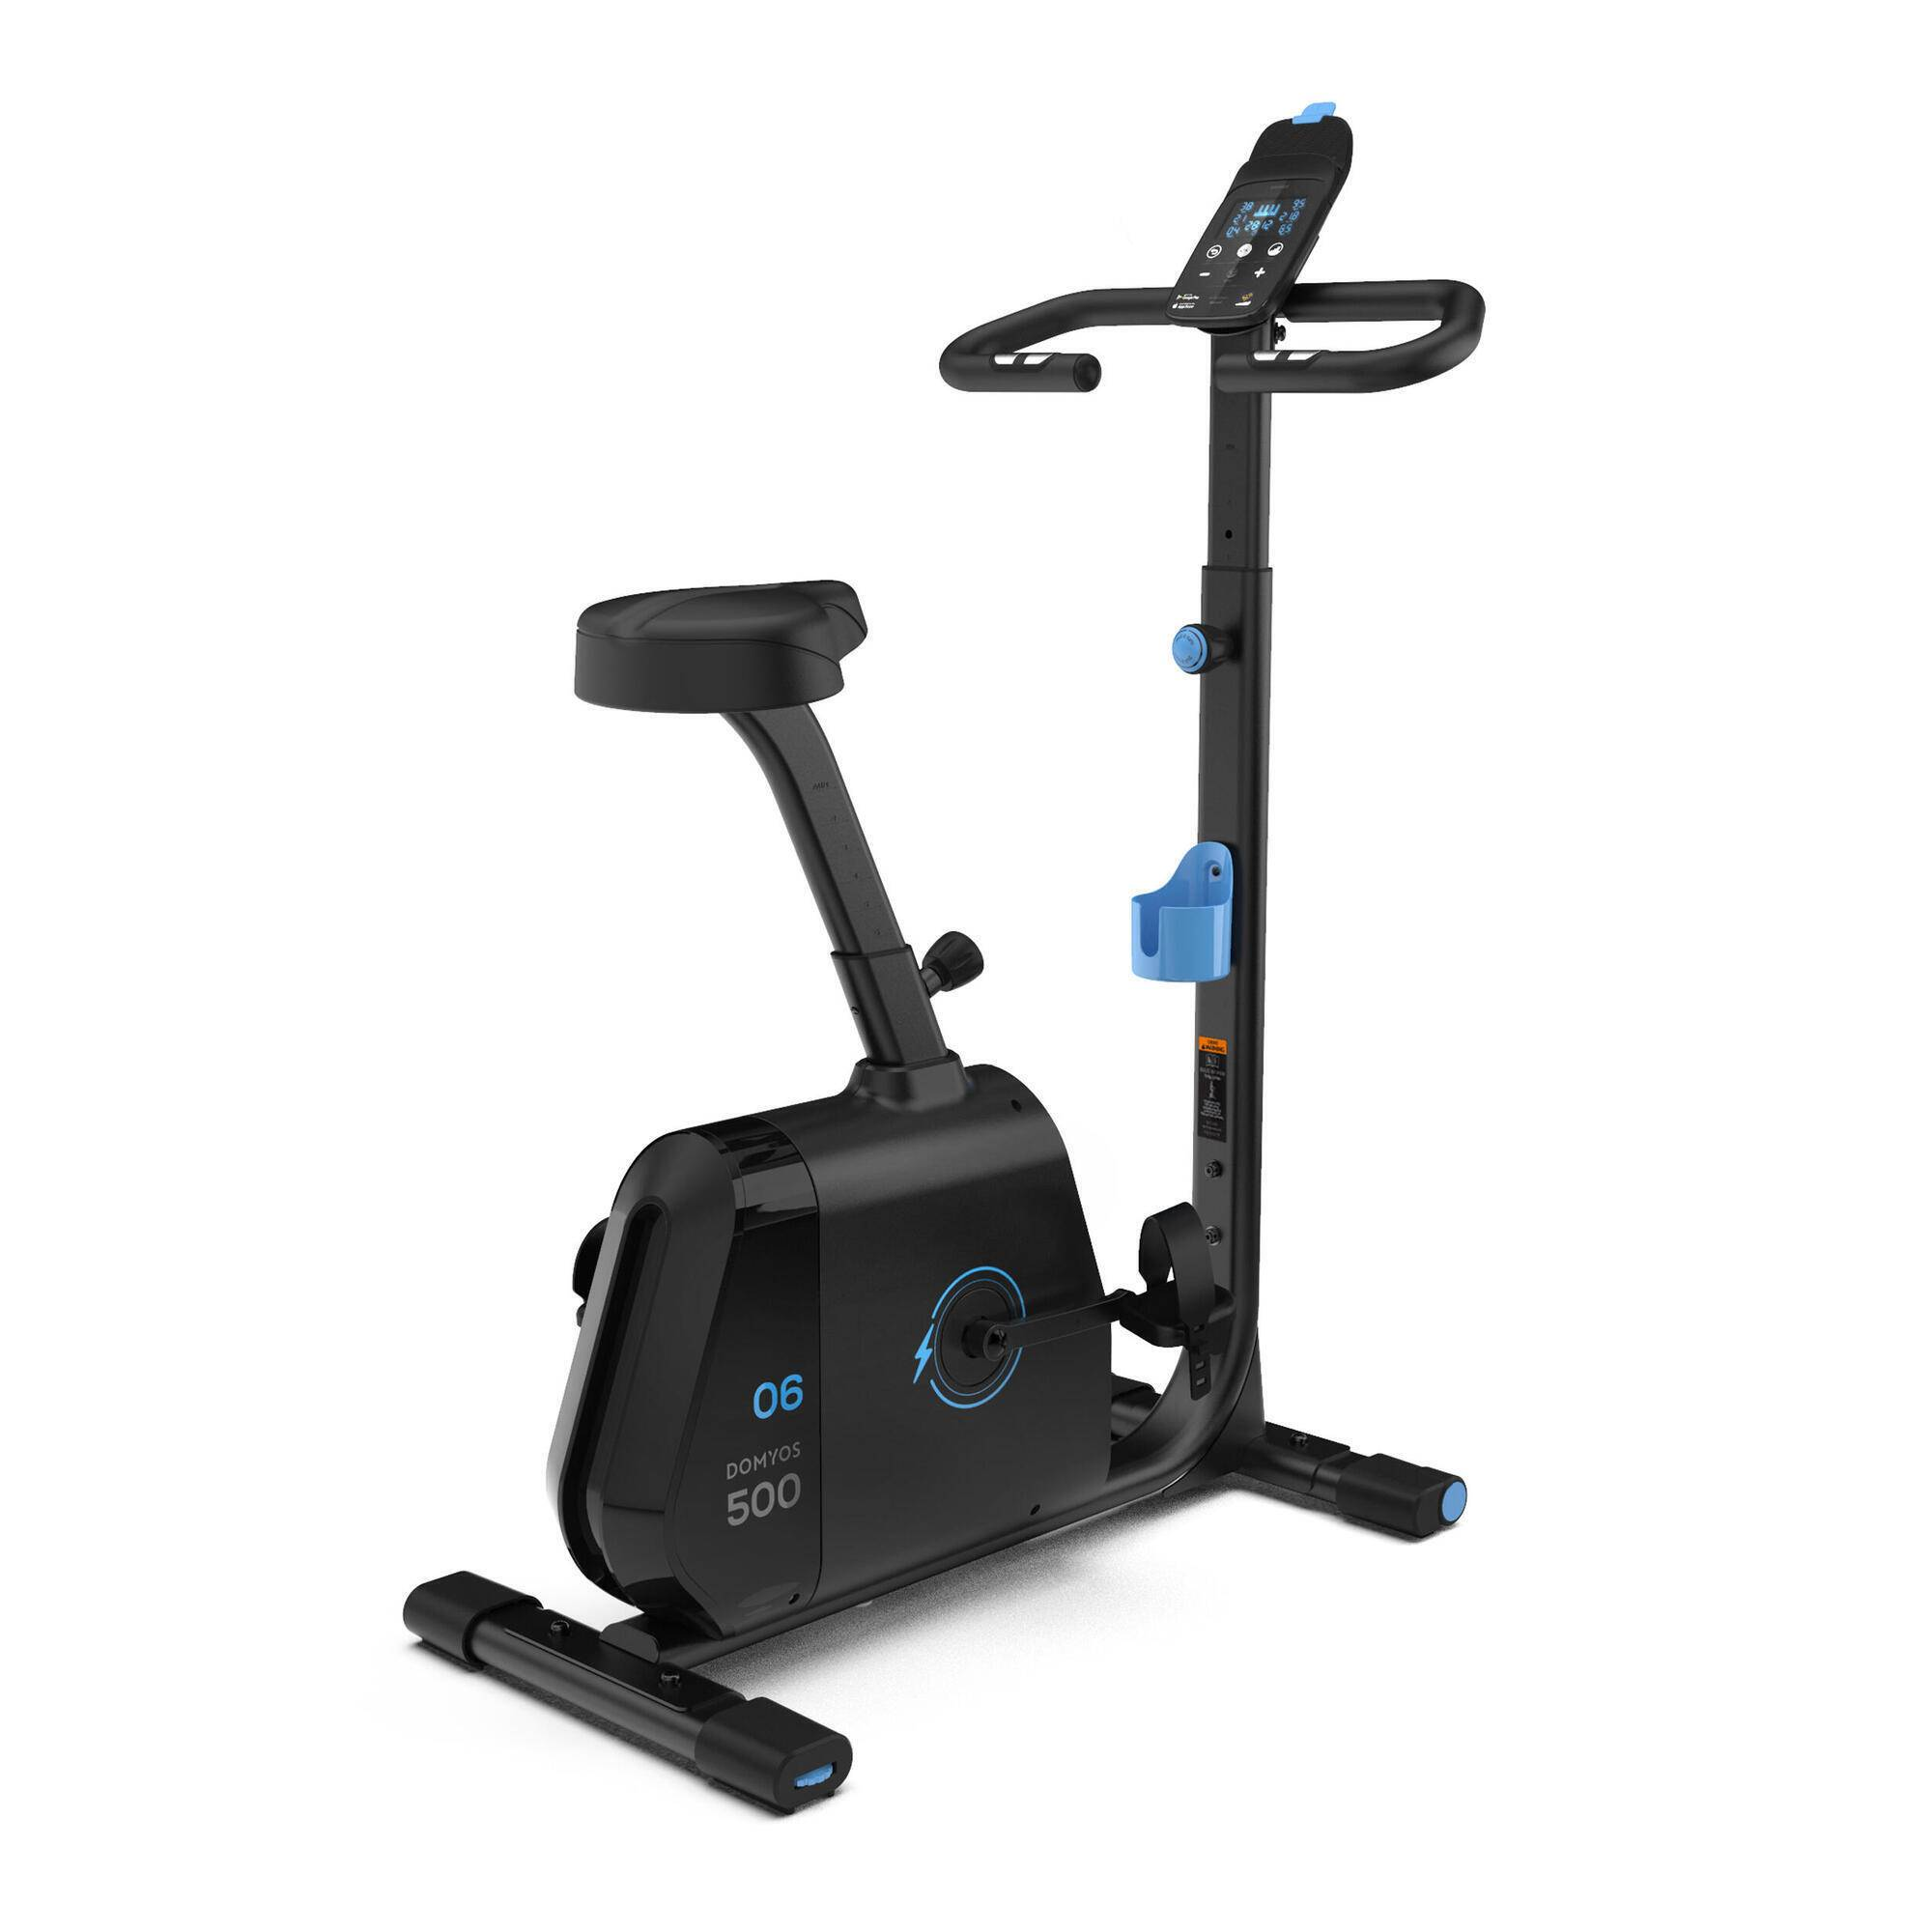 Domyos Cyclette autoalimentata connessa EB 500